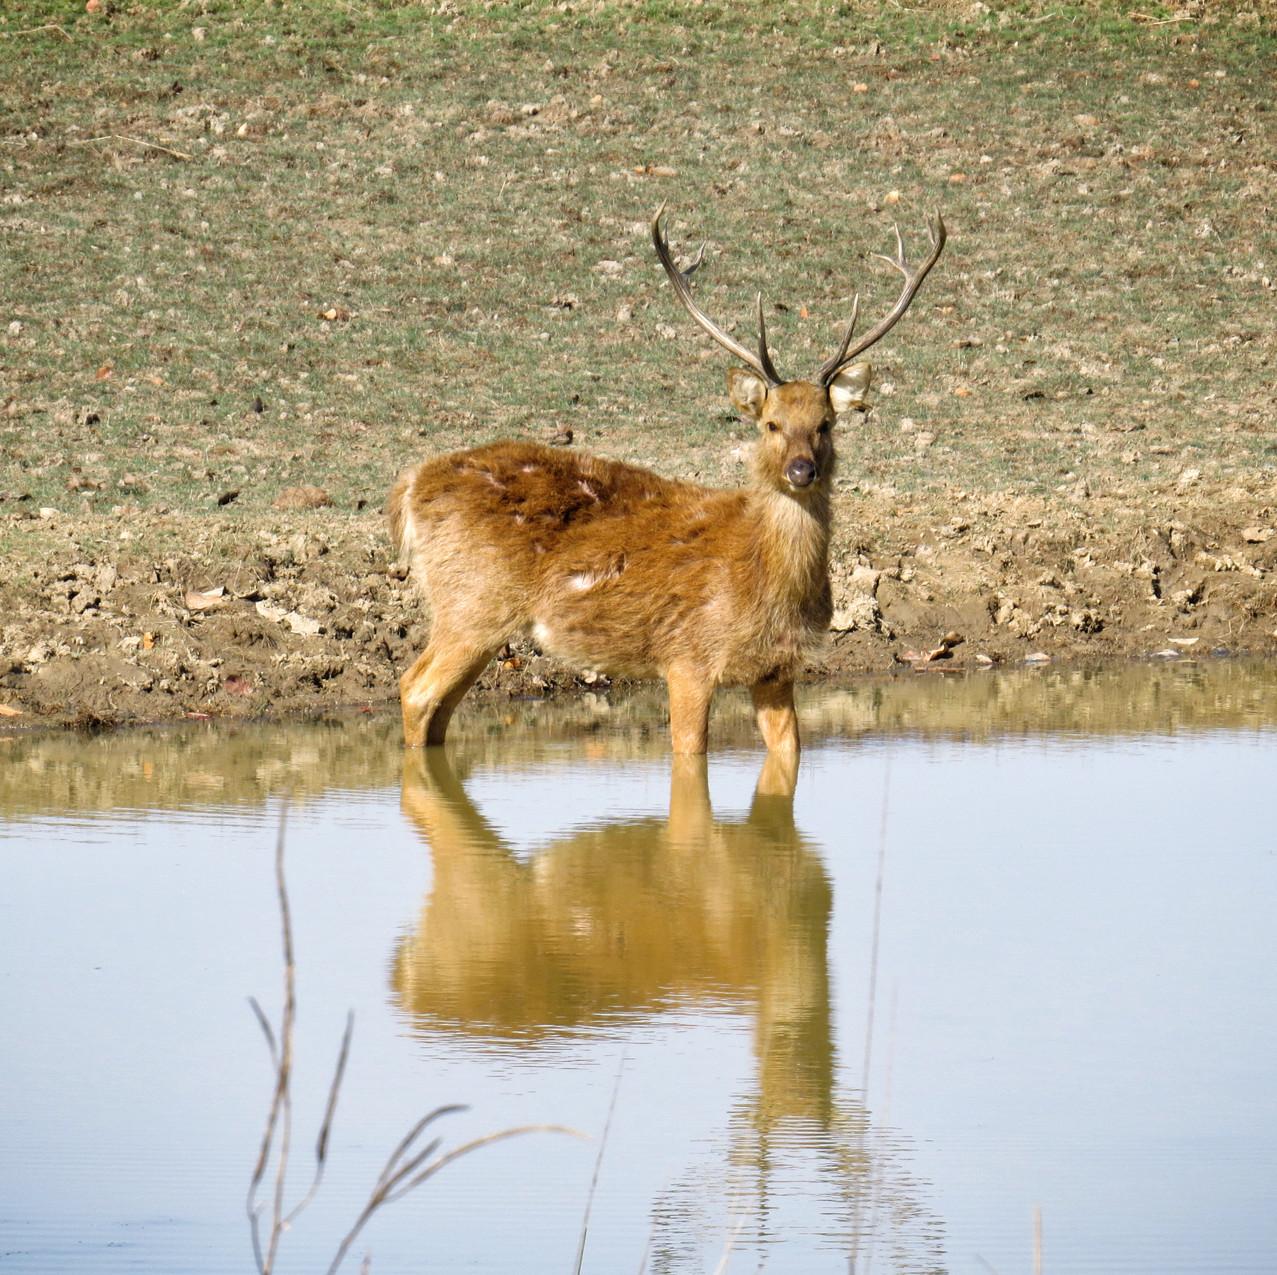 Swamp Deer - Barasingha